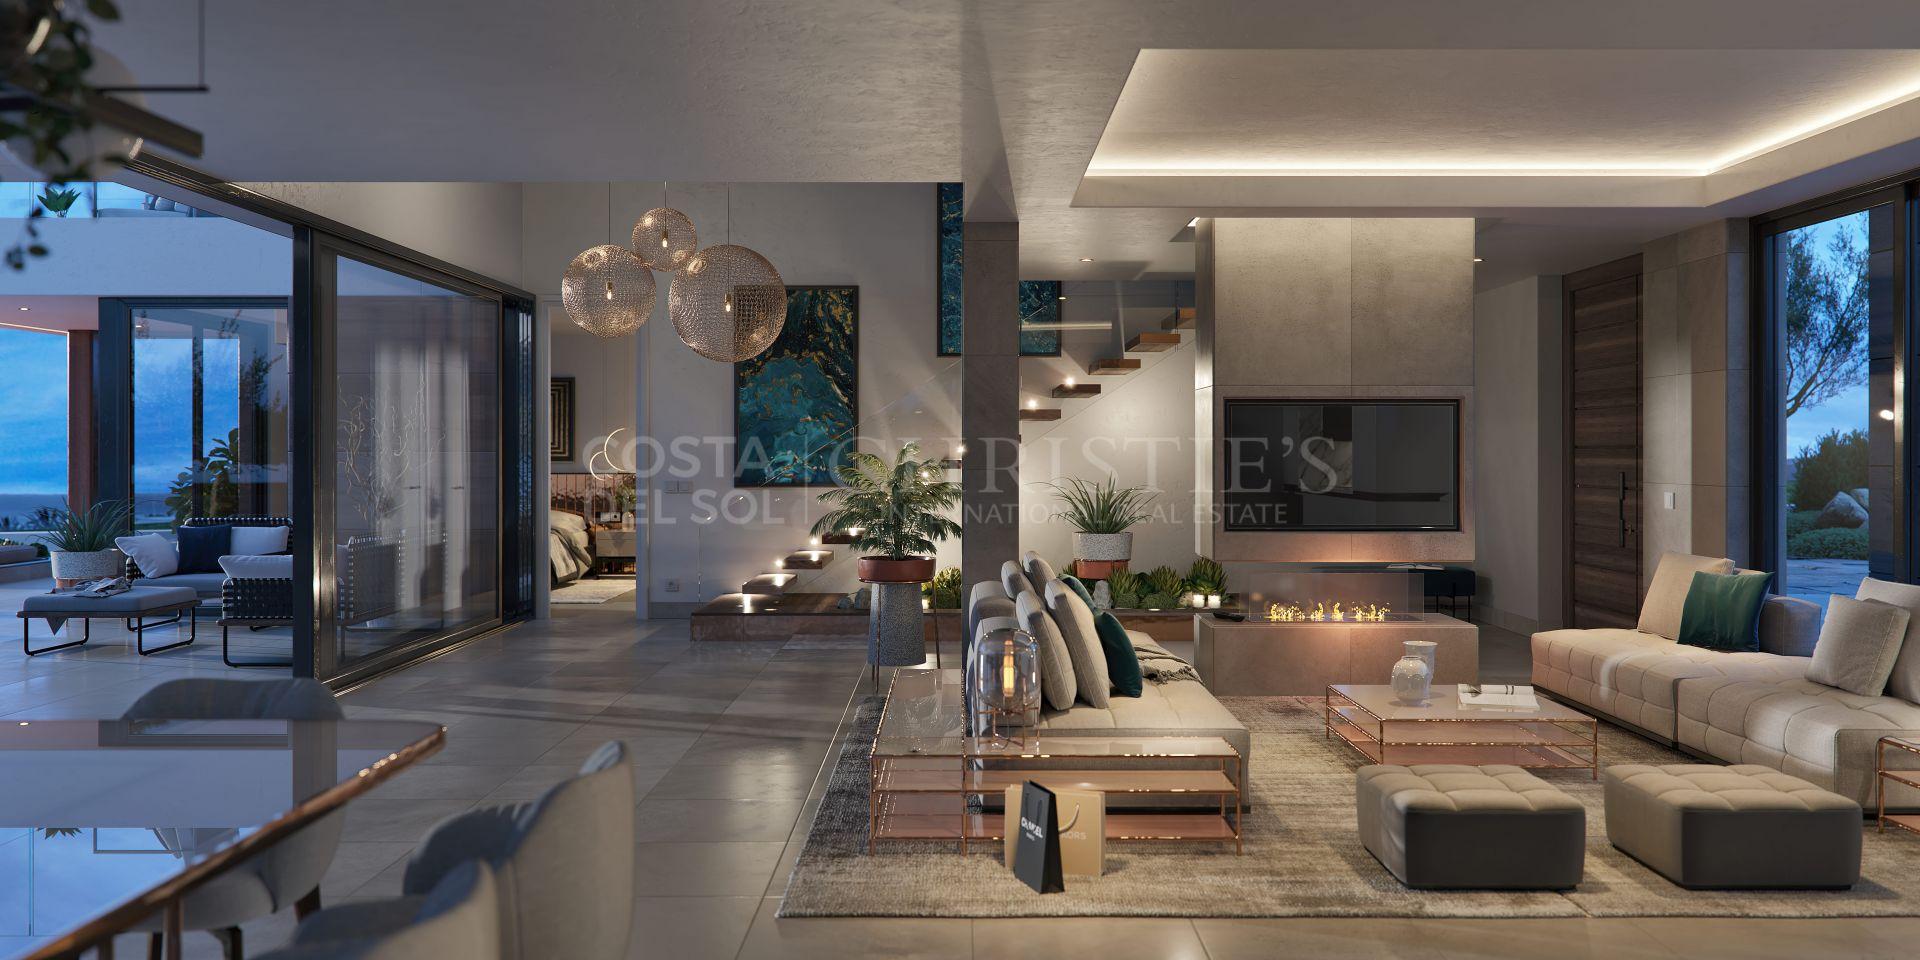 Perfect Villa Silk, New Golden Mile, Estepona | Christie's International Real Estate